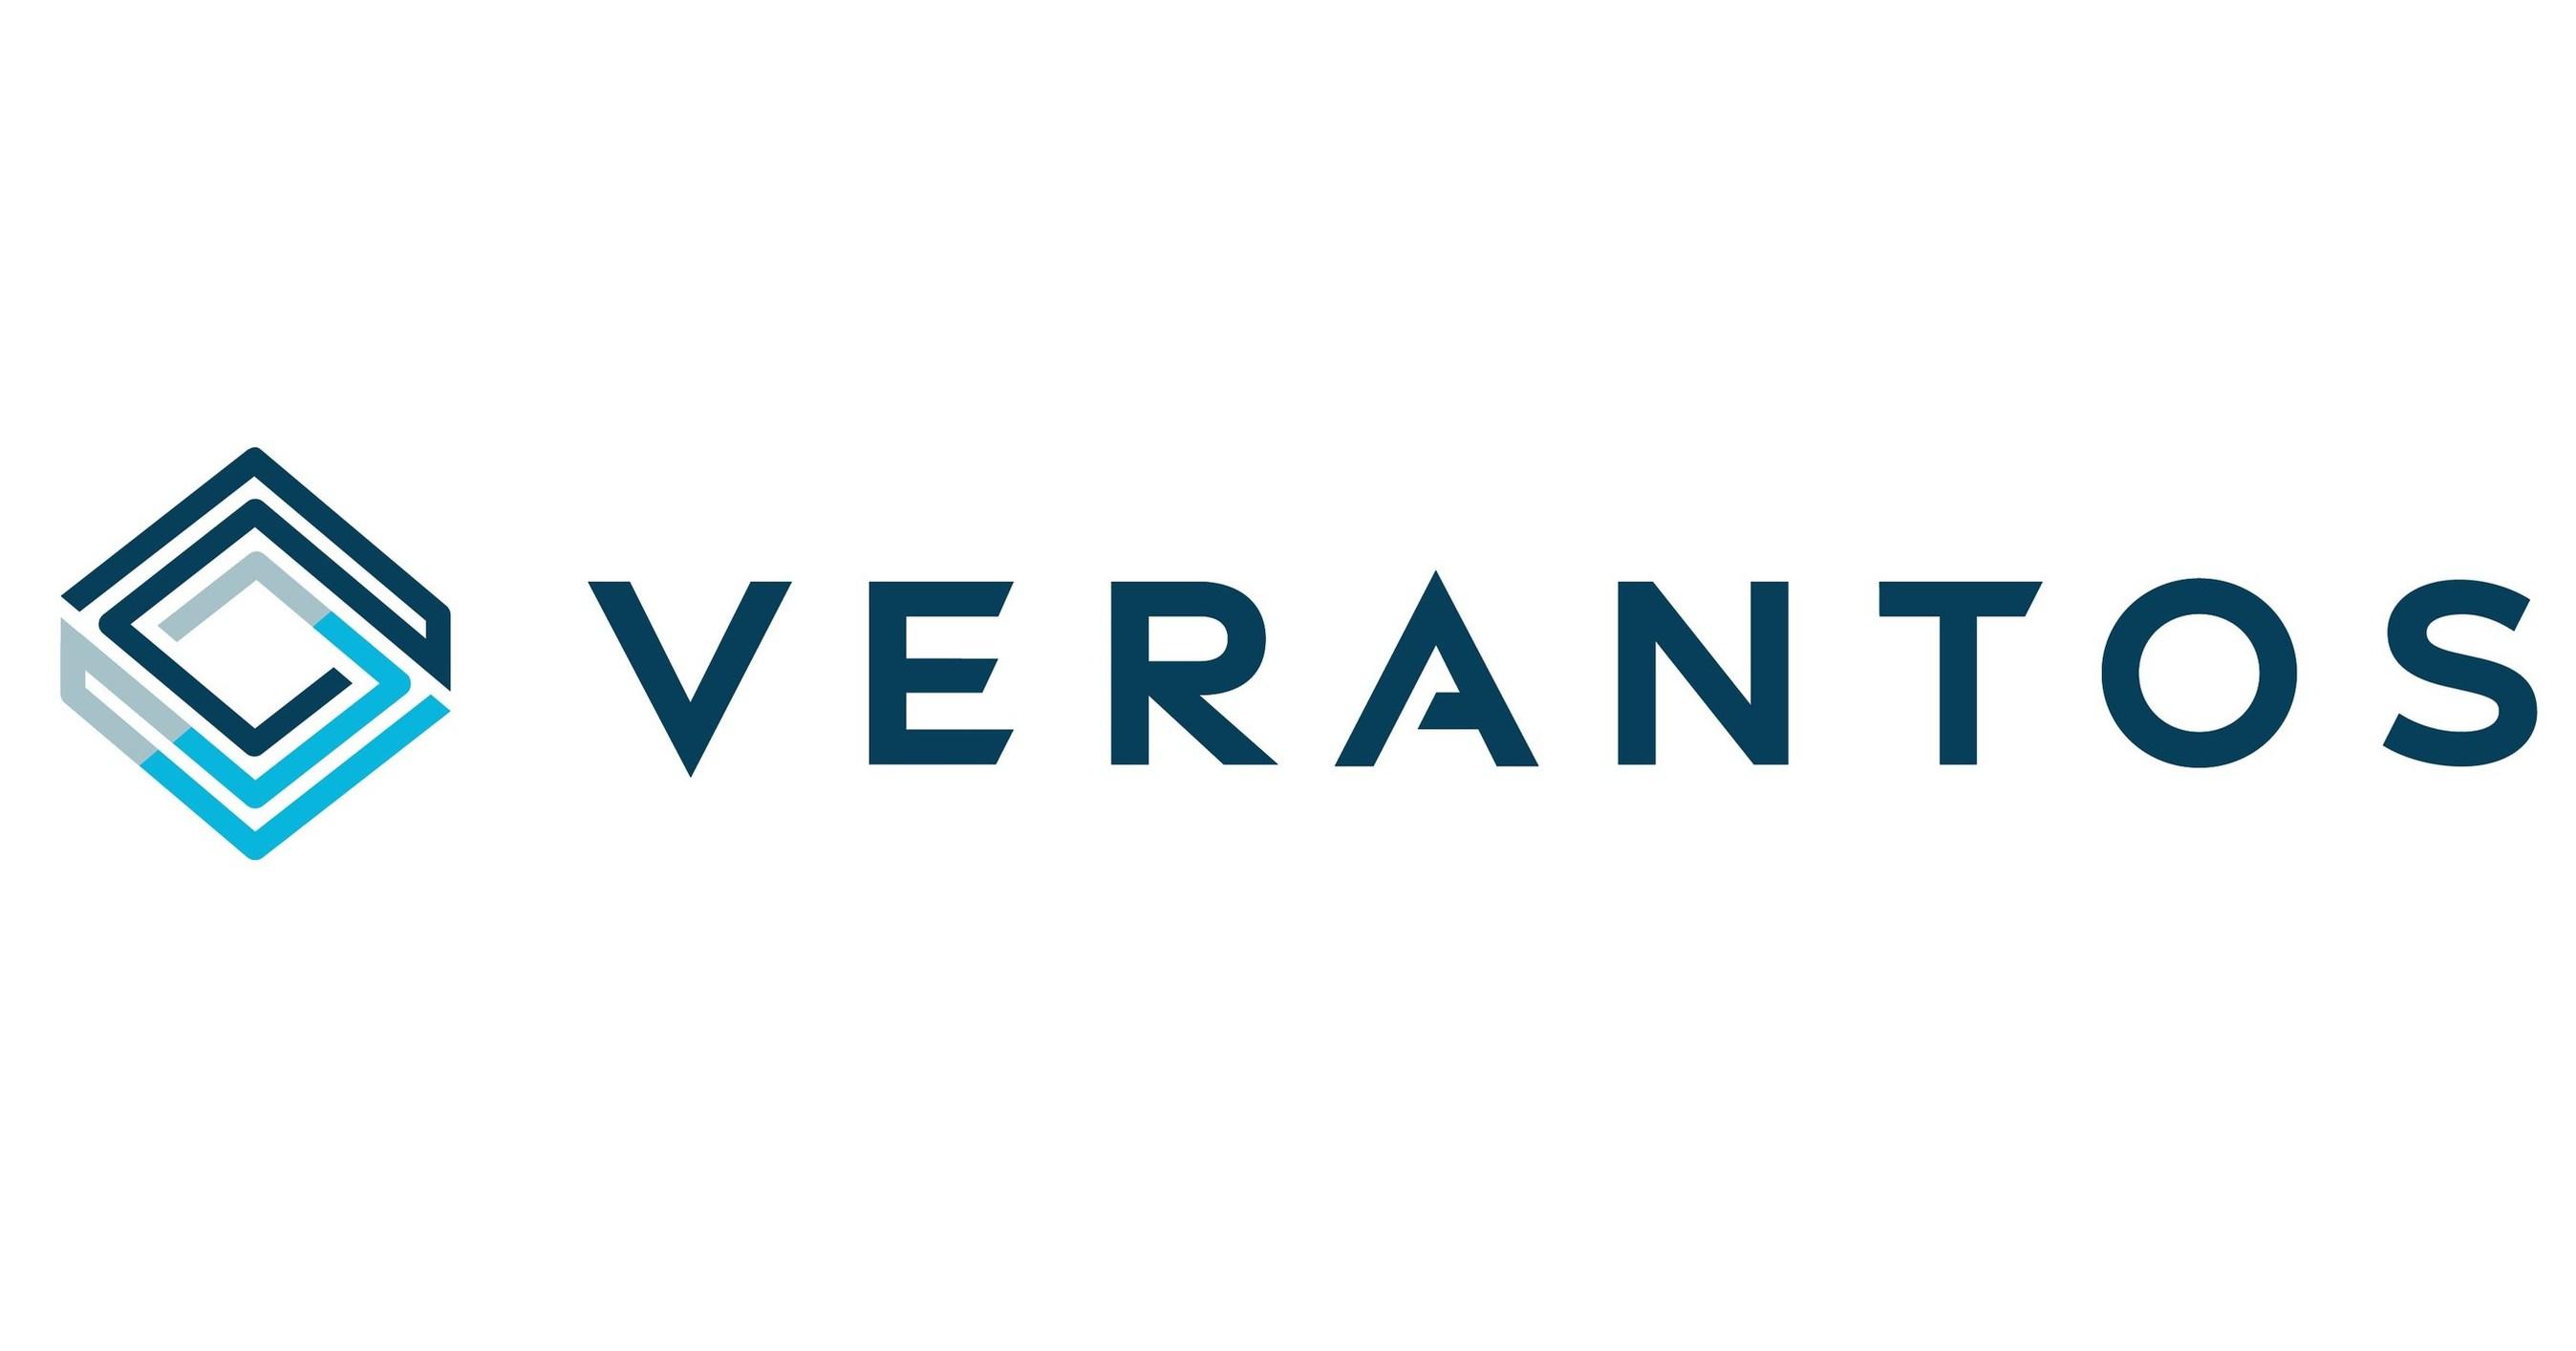 Verantos Logo jpg?p=facebook.